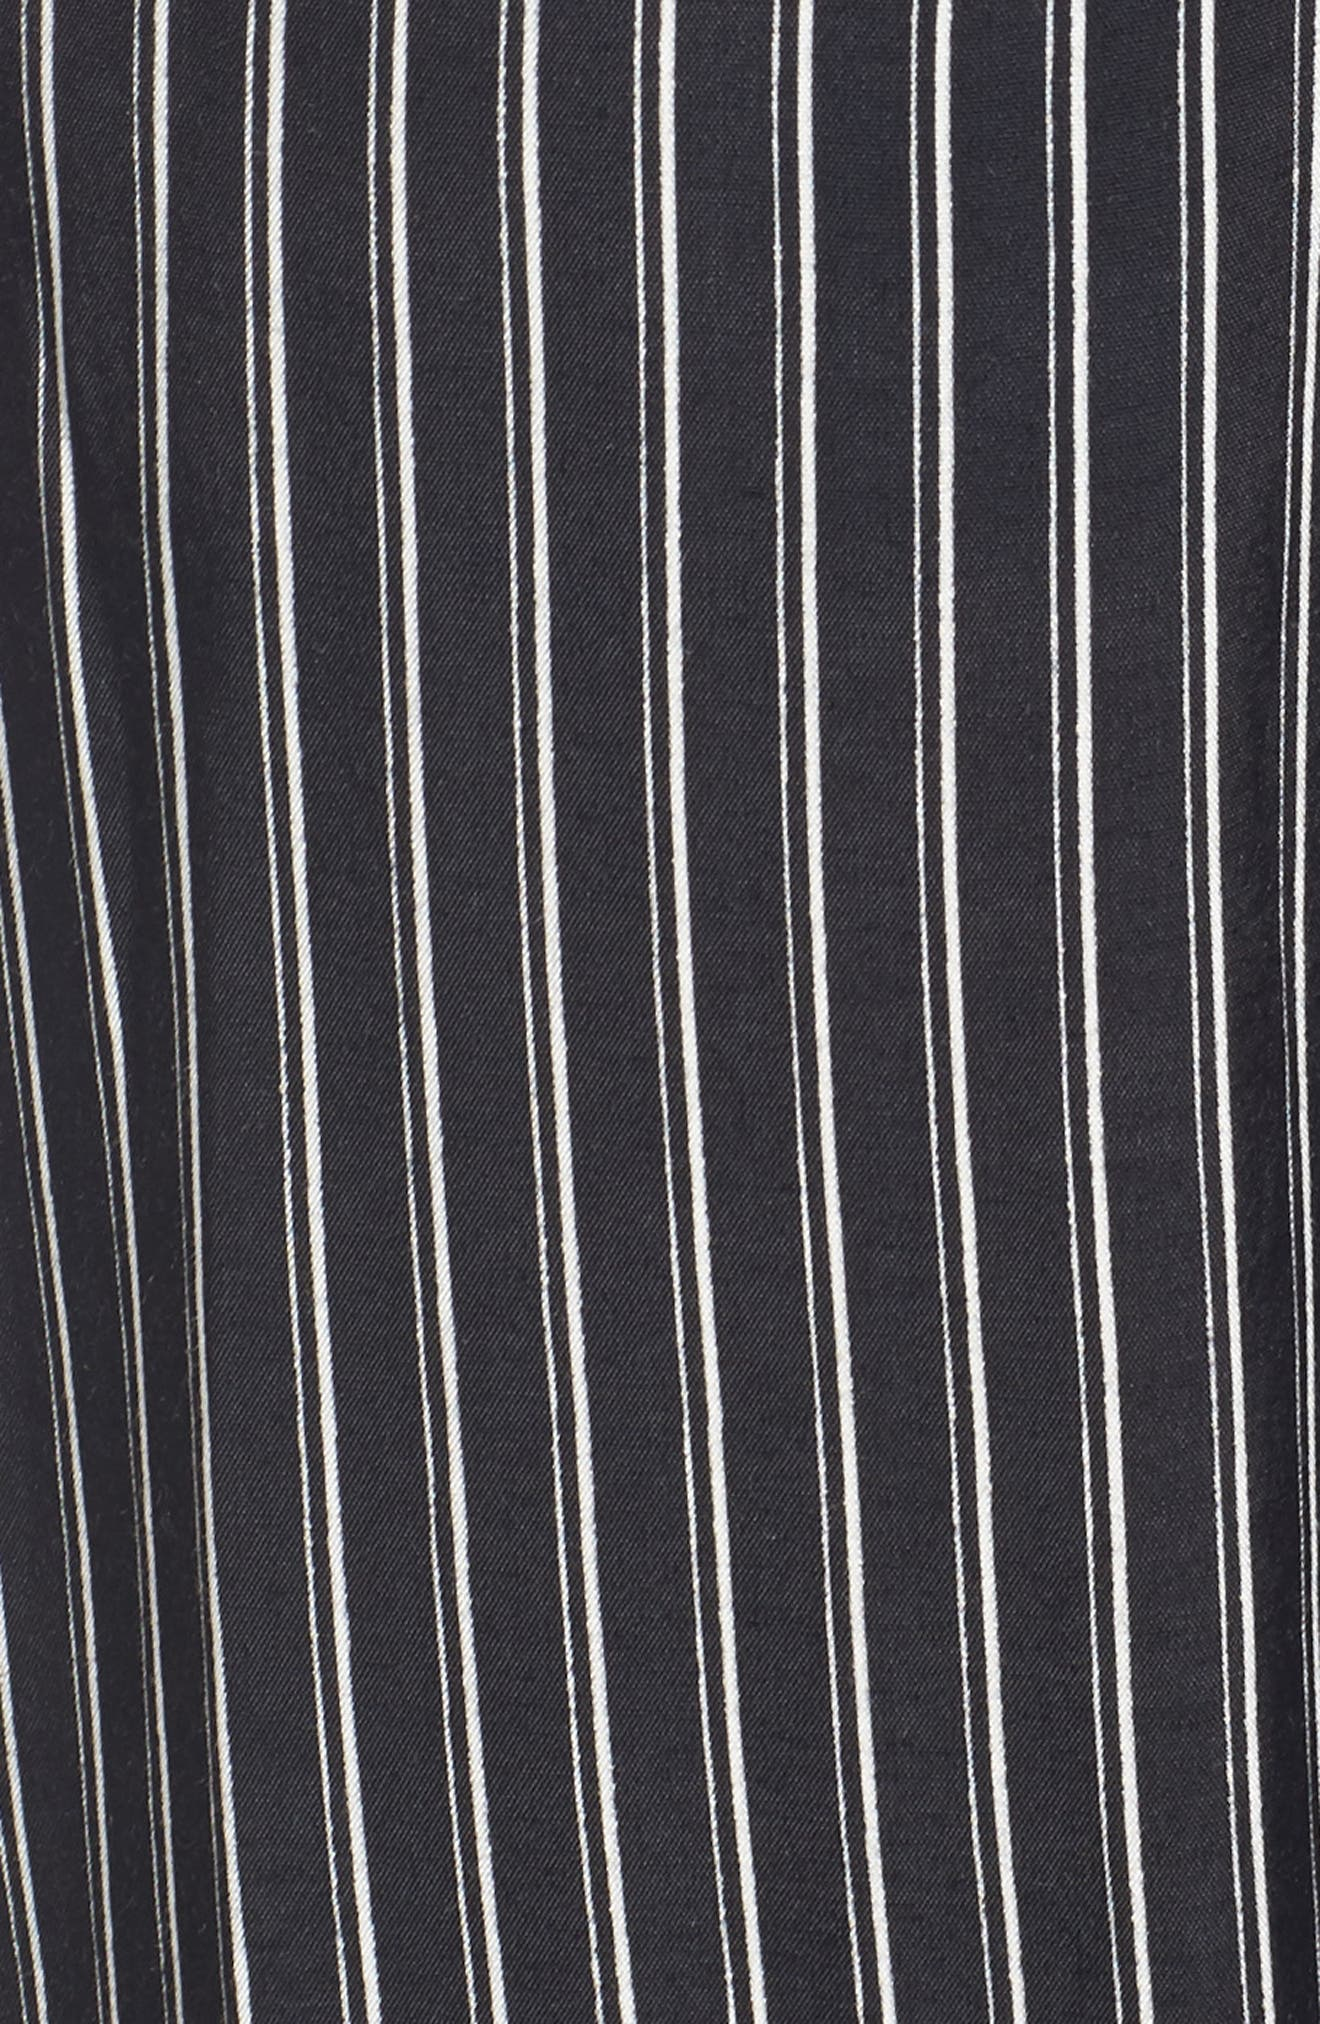 Cedric Plunging Pinstripe Jumpsuit,                             Alternate thumbnail 4, color,                             San Cristobal Stripe Print